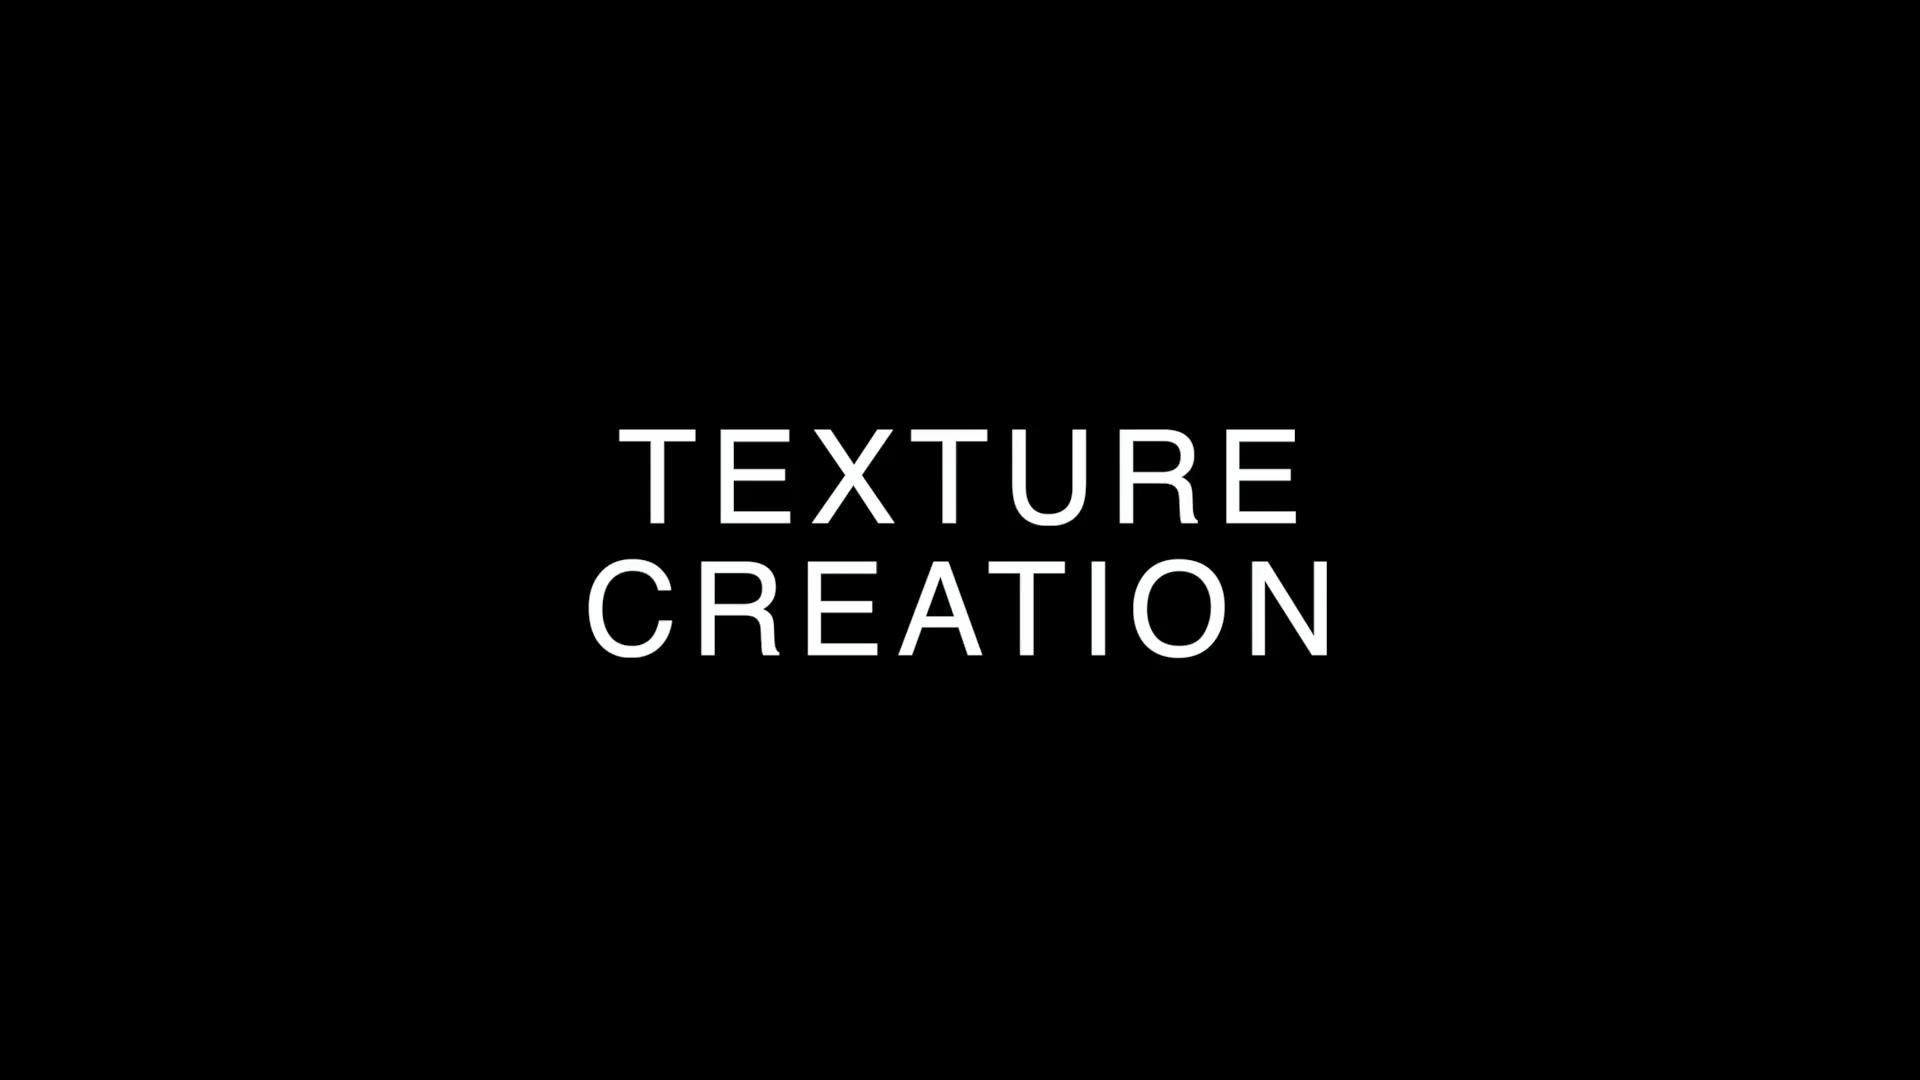 Texture creation